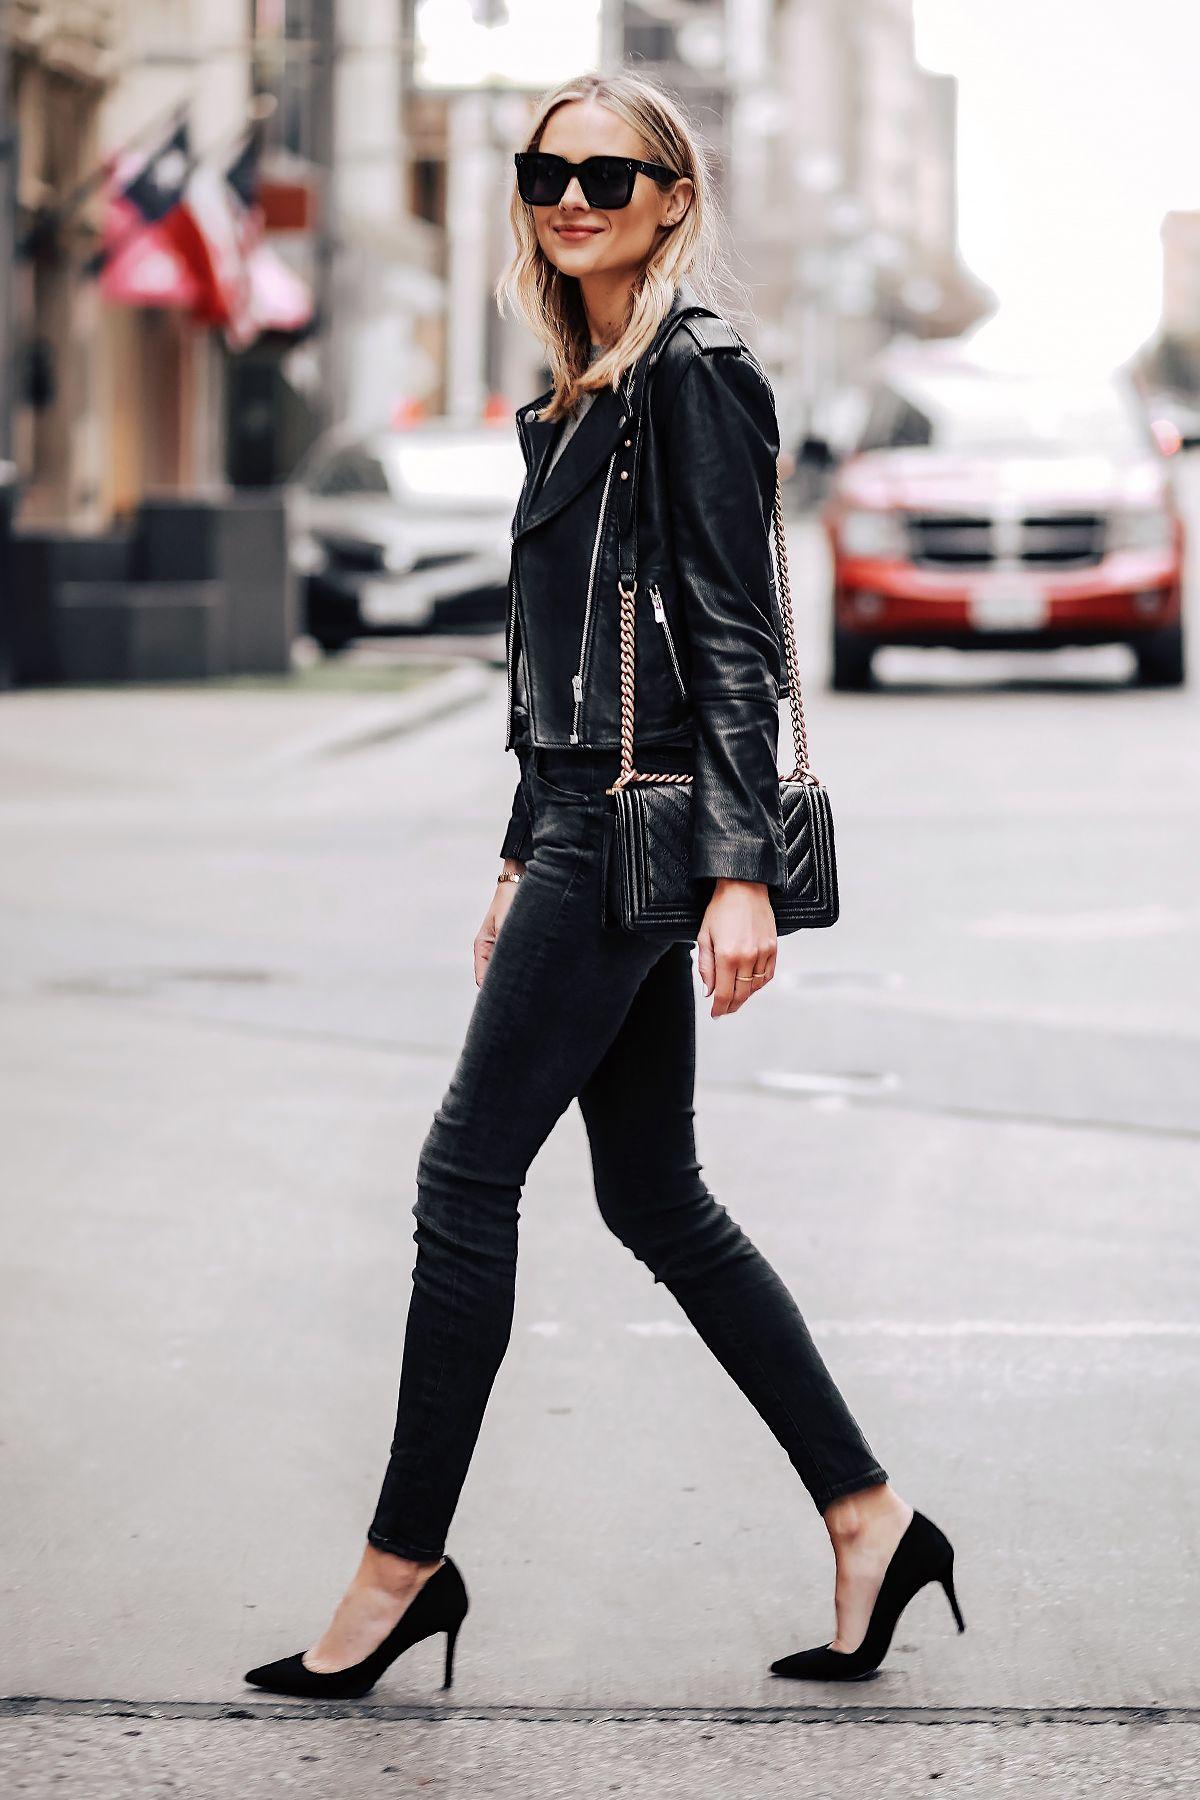 6e73cf1f4f6 Blonde Woman Wearing Club Monaco Black Leather Jacket Black Skinny Jeans  Black Pumps Chanel Black Boy Bag Fashion Jackson San Diego Fashion Blogger  Street ...